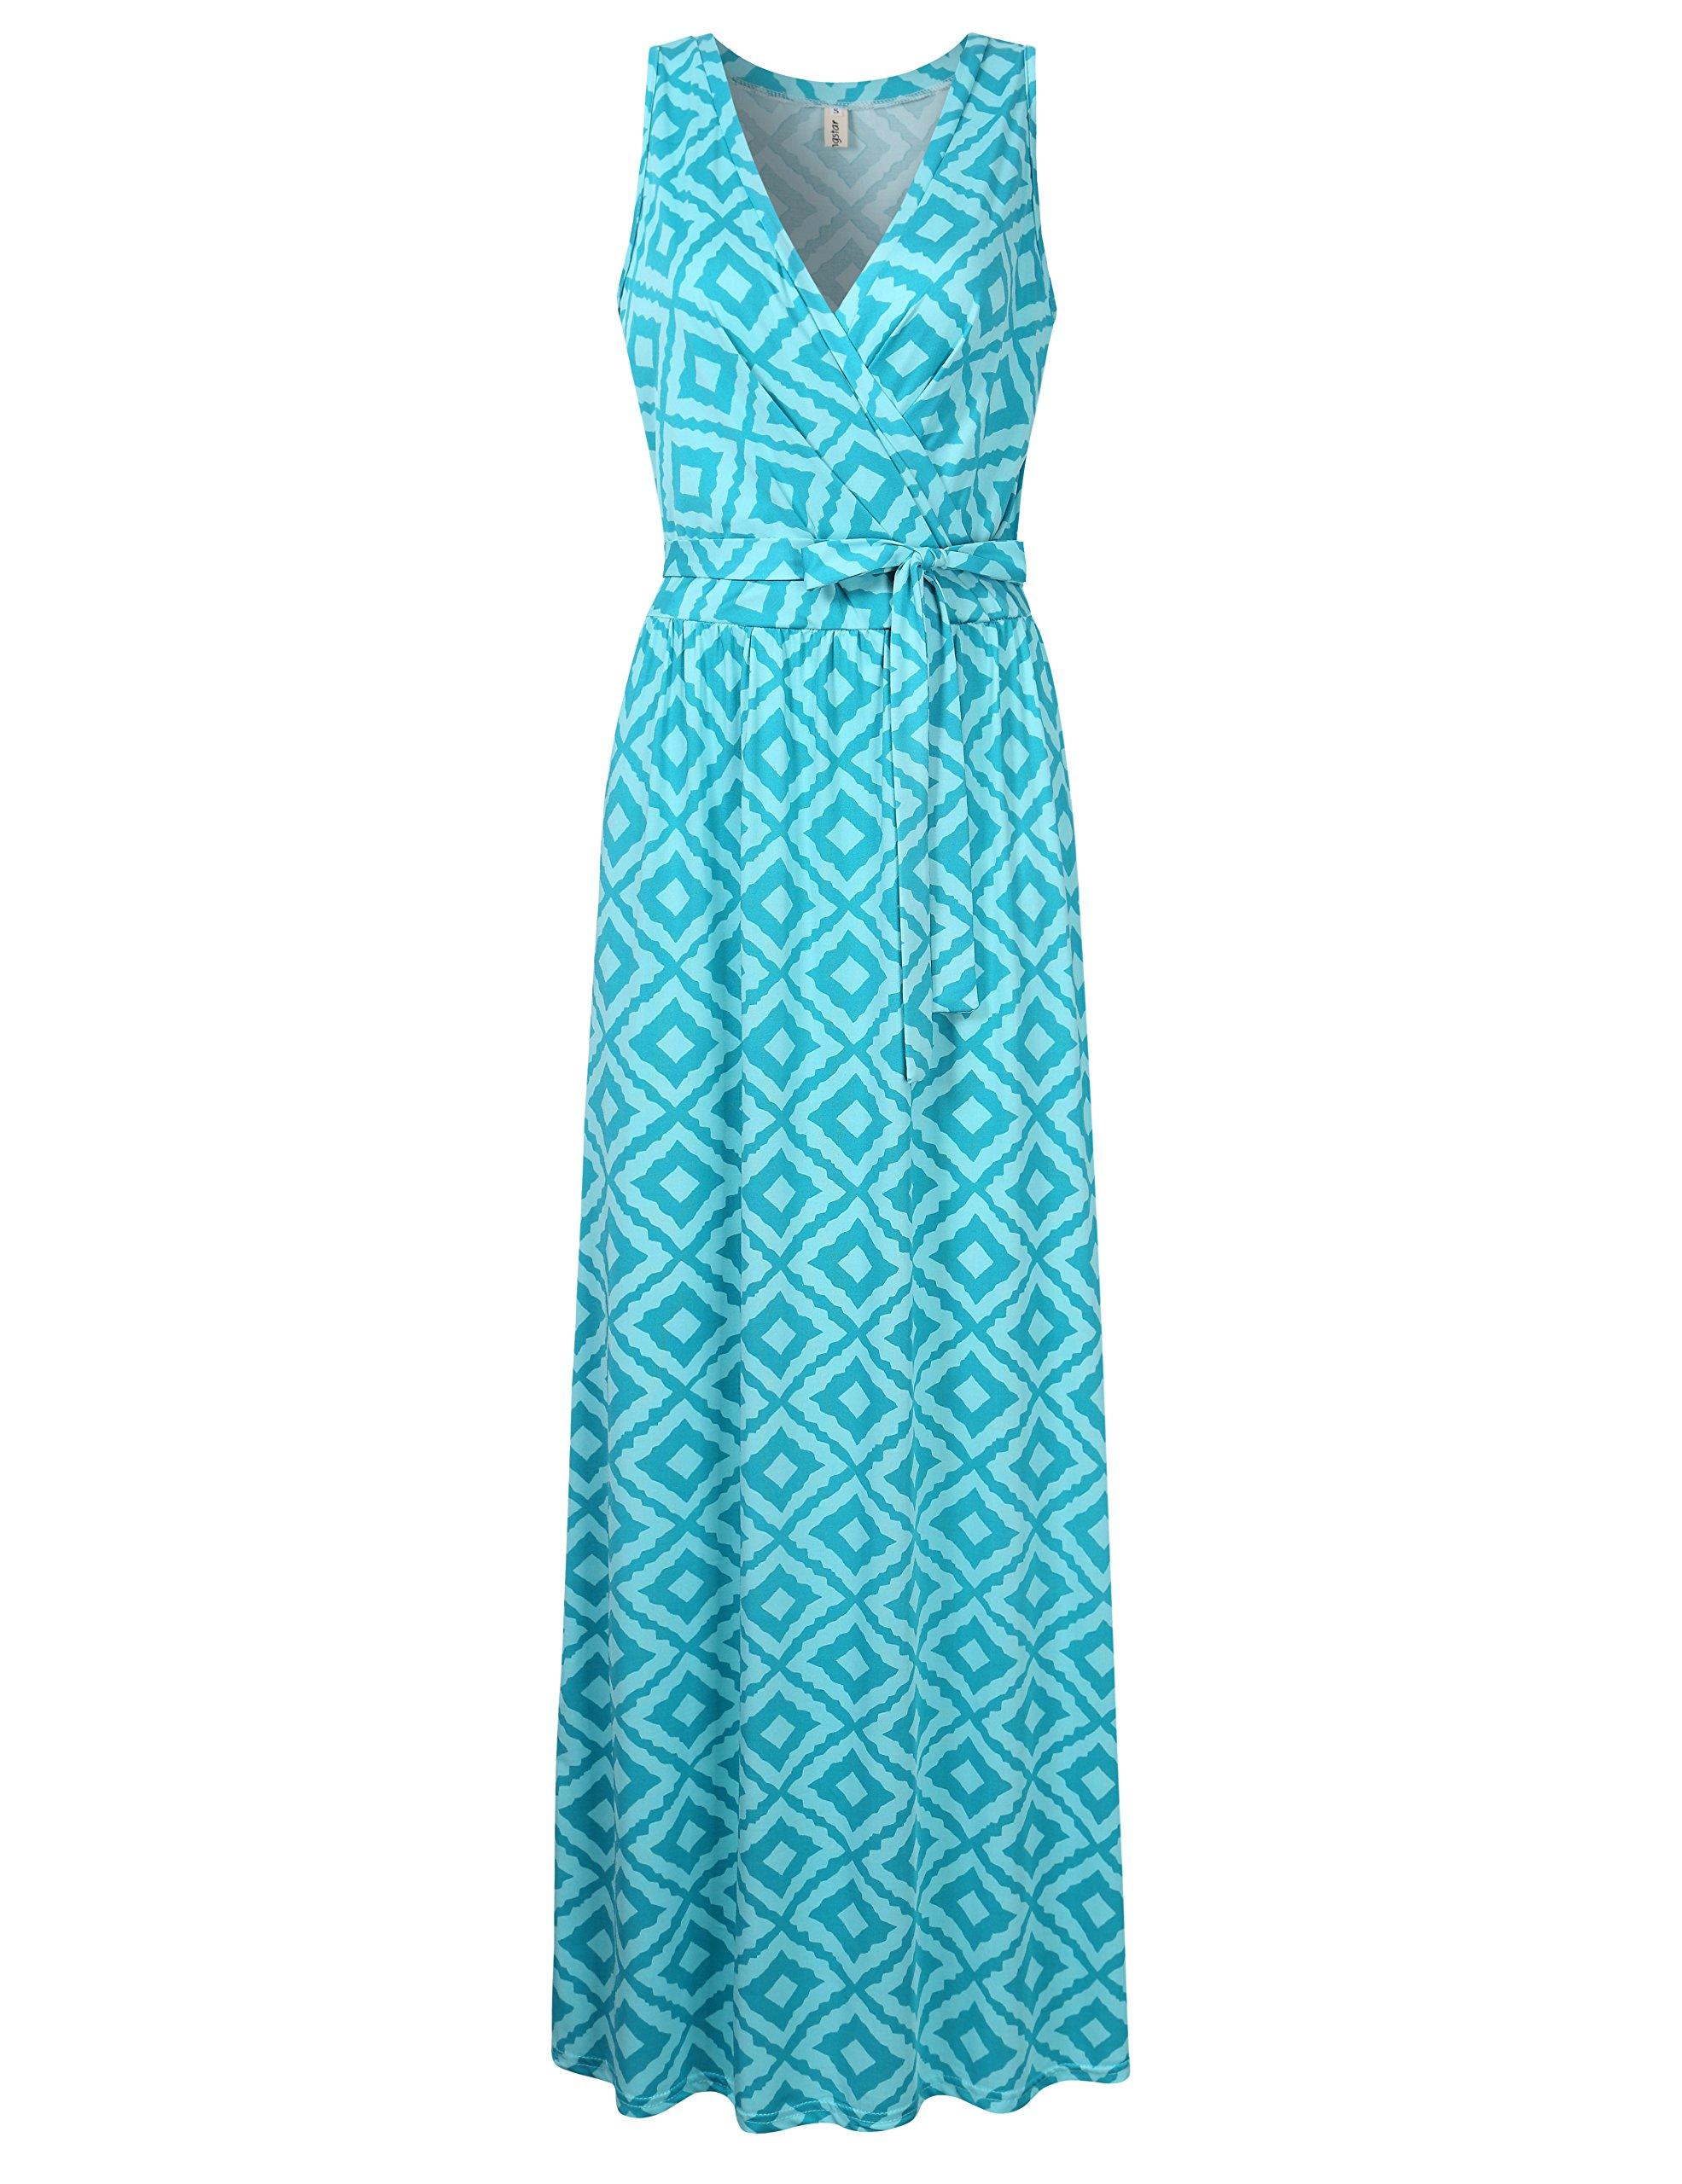 Leadingstar Women's Bohemian Sleeveless V Neck Wrap Long Maxi Summer Dress Green Rhombus XL